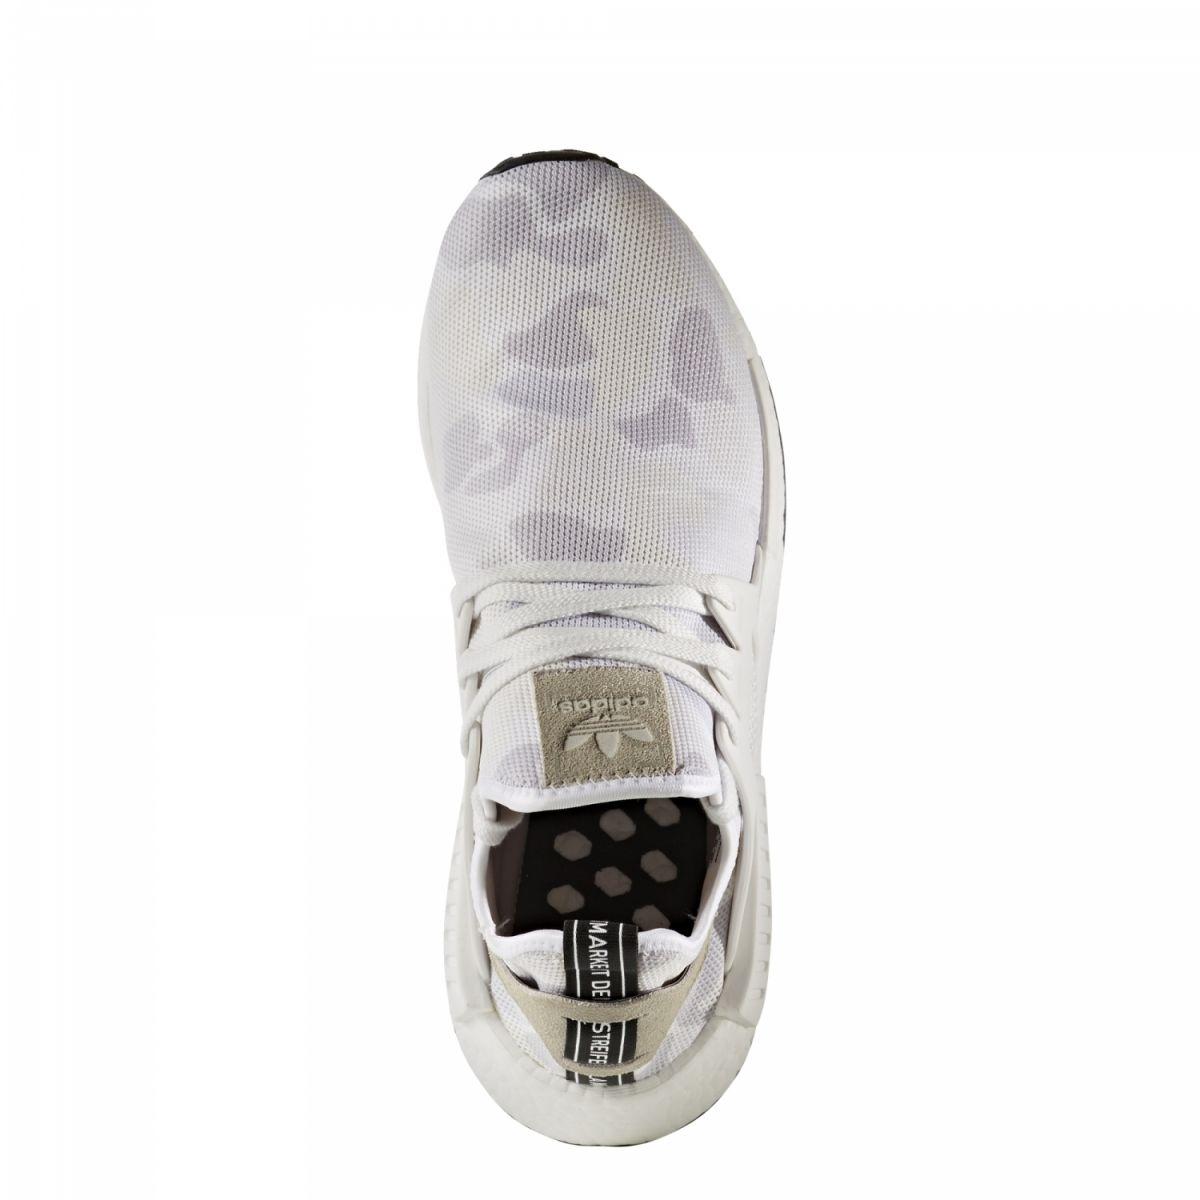 sport klingenmaier adidas originals nmd xr1 pk sneaker. Black Bedroom Furniture Sets. Home Design Ideas